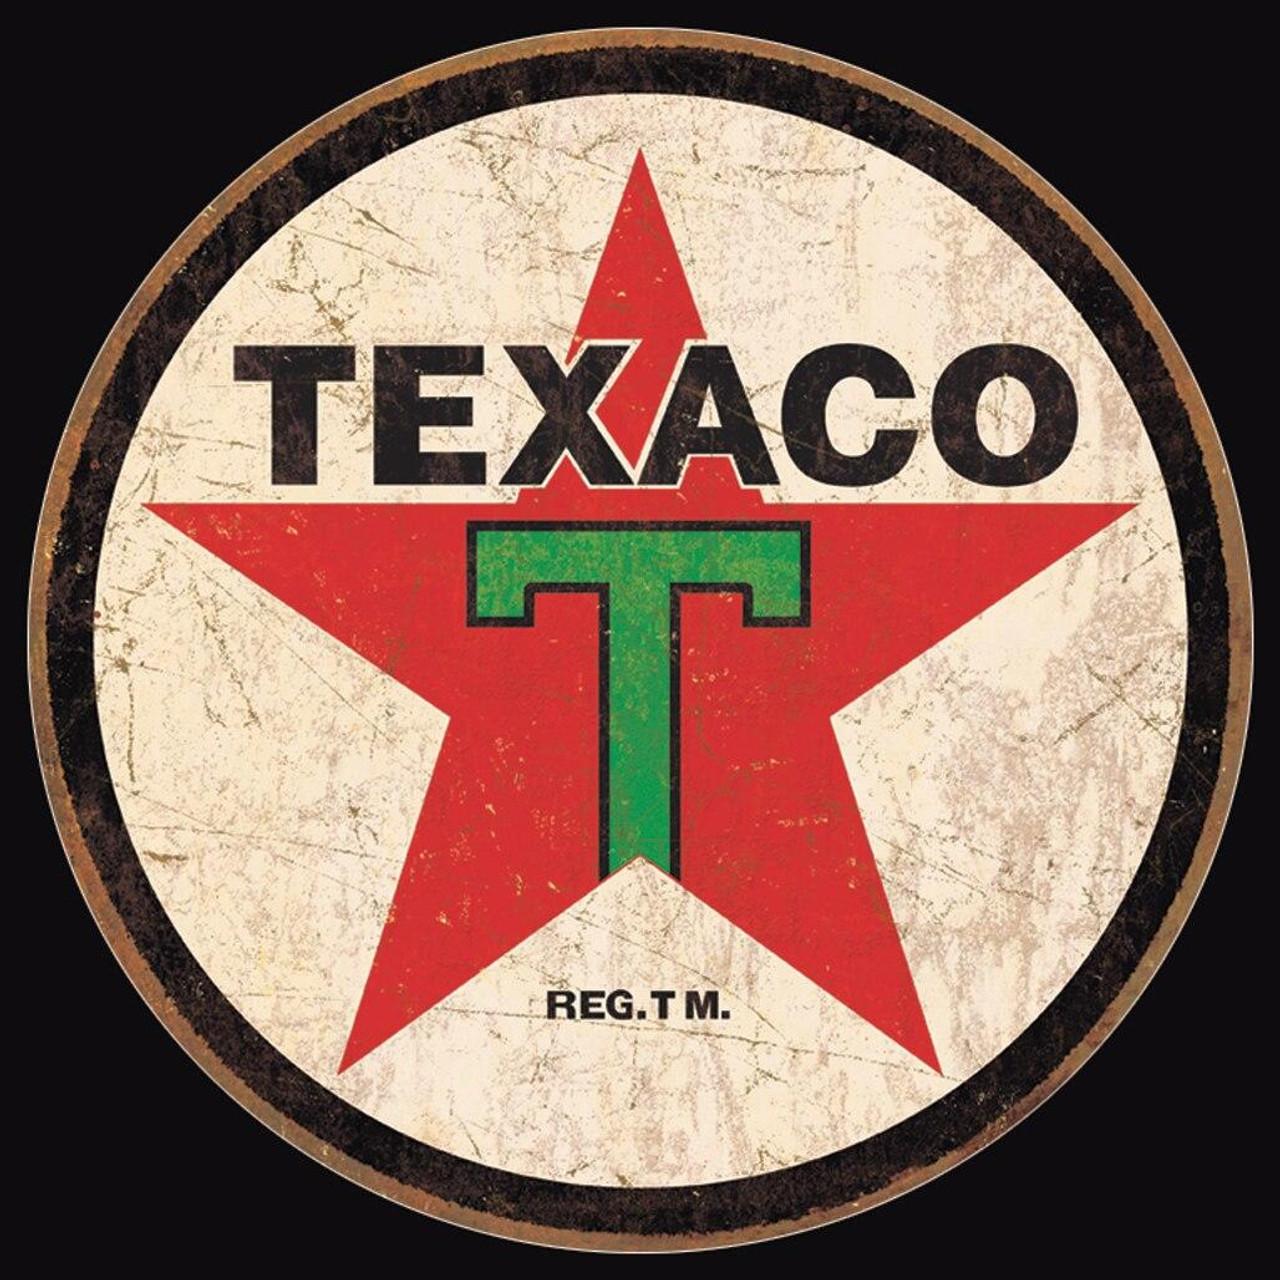 Texaco Texaco 36 ROUND